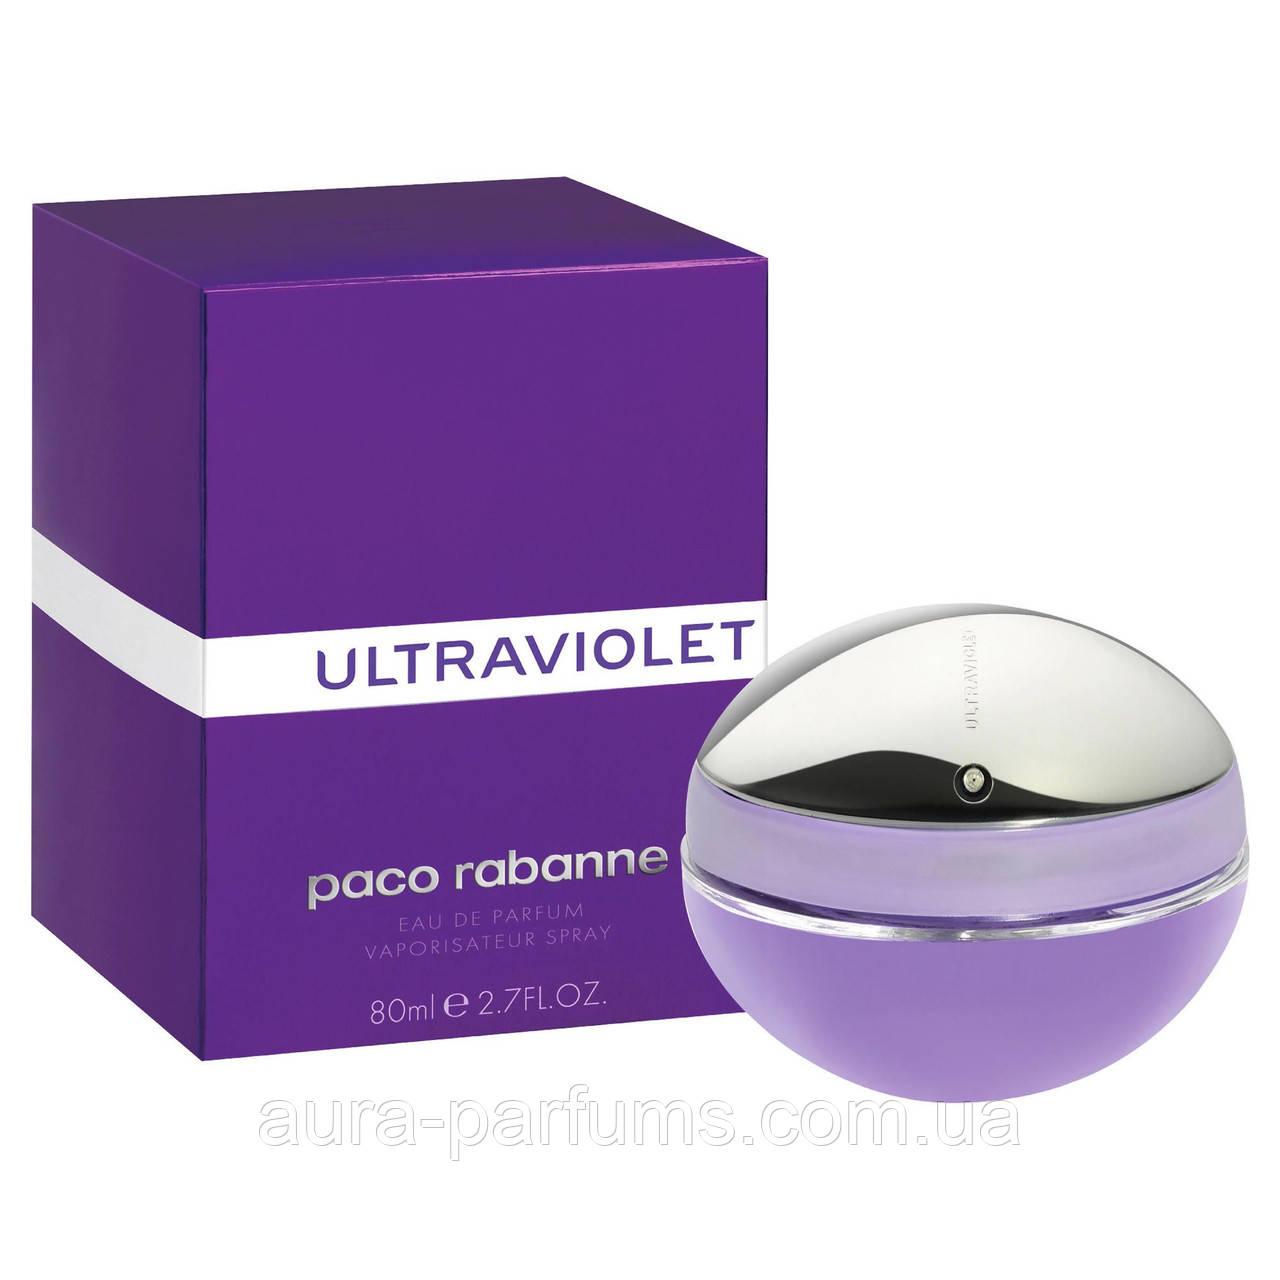 Paco Rabanne Ultraviolet edp 80 ml. оригінал